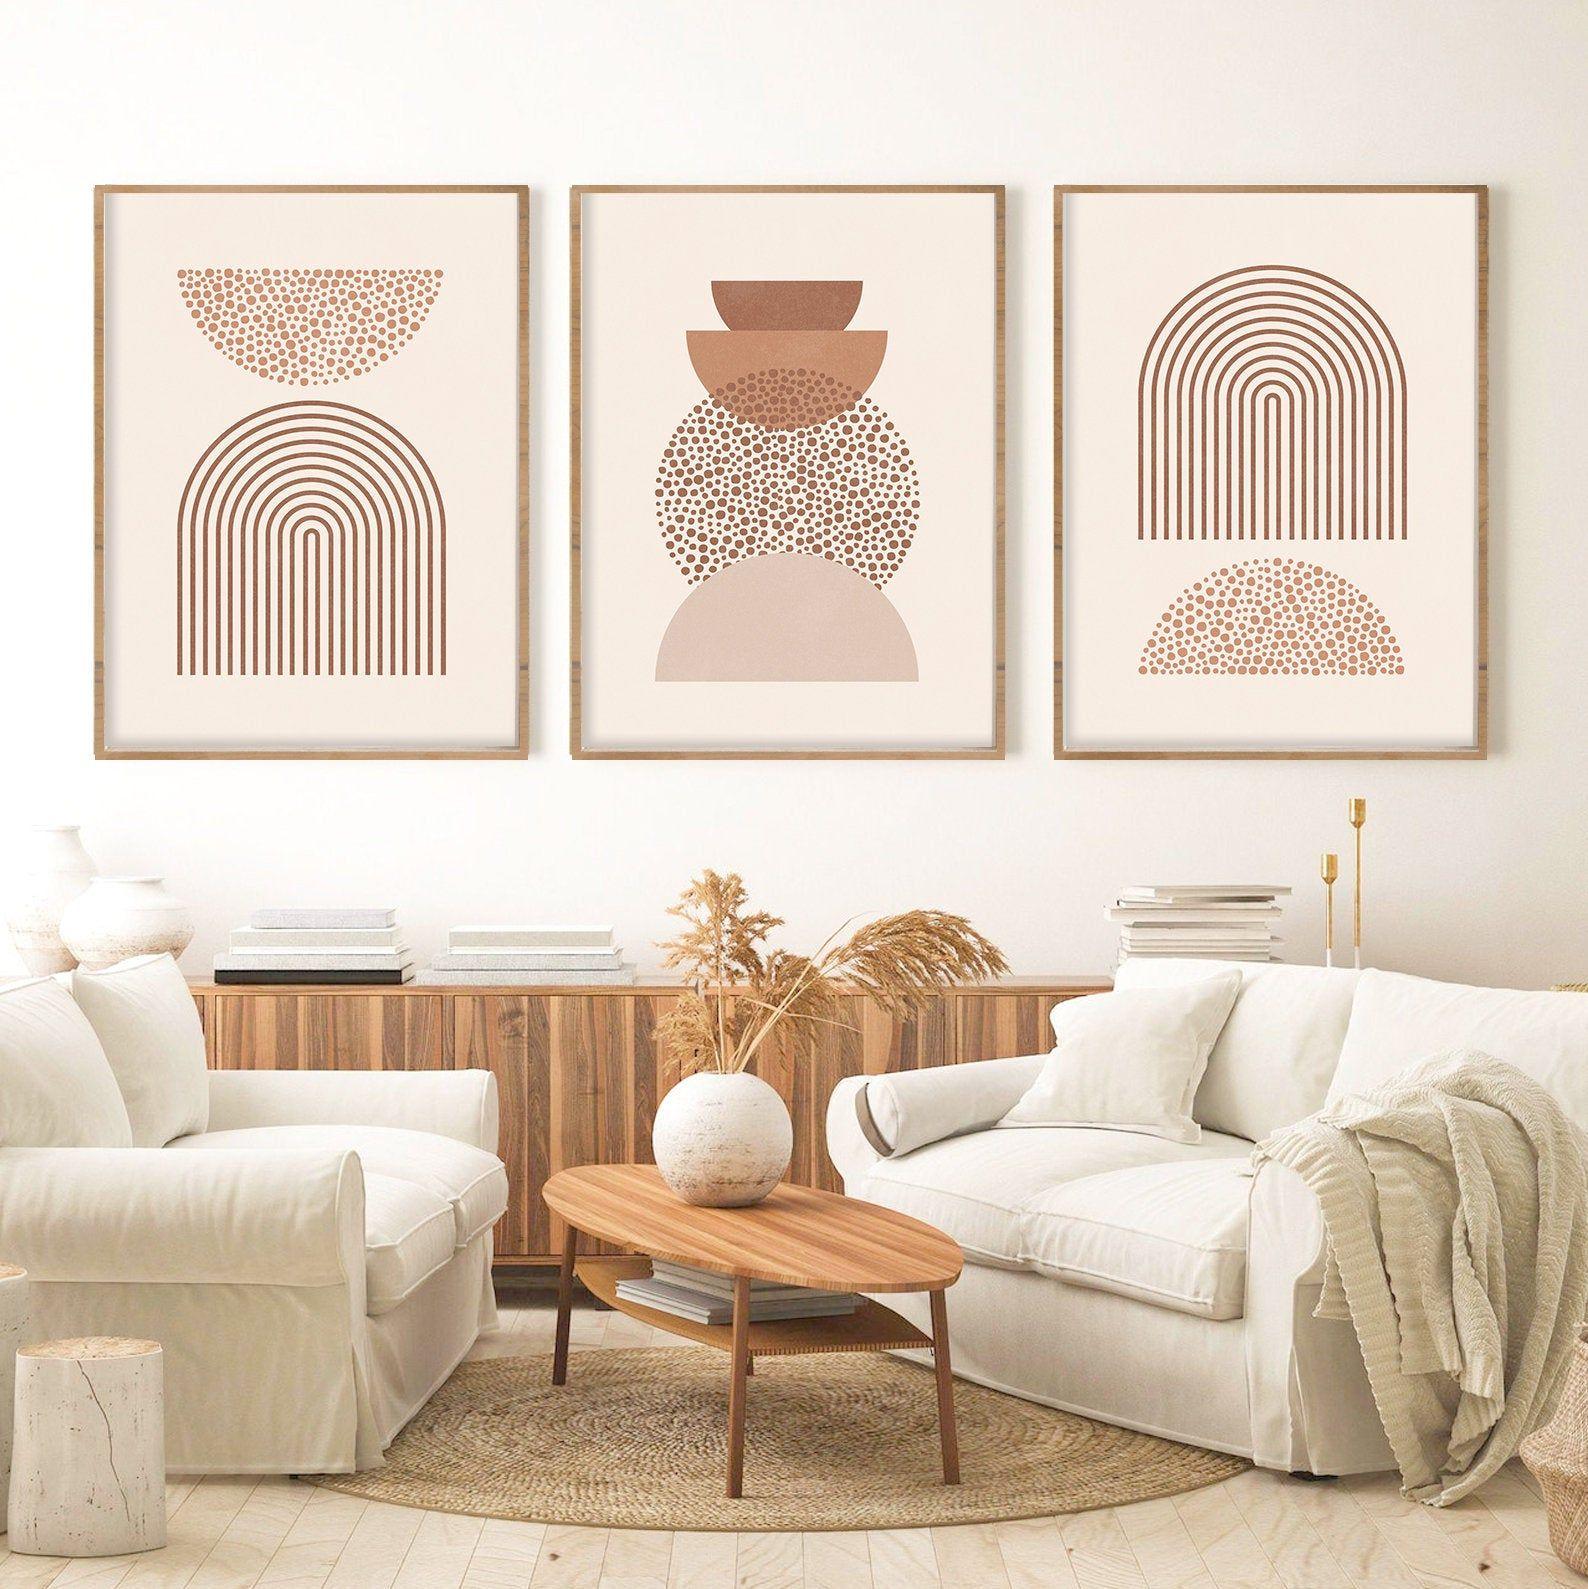 Abstract Art Set of 3 Boho Wall Prints Decor, Mid